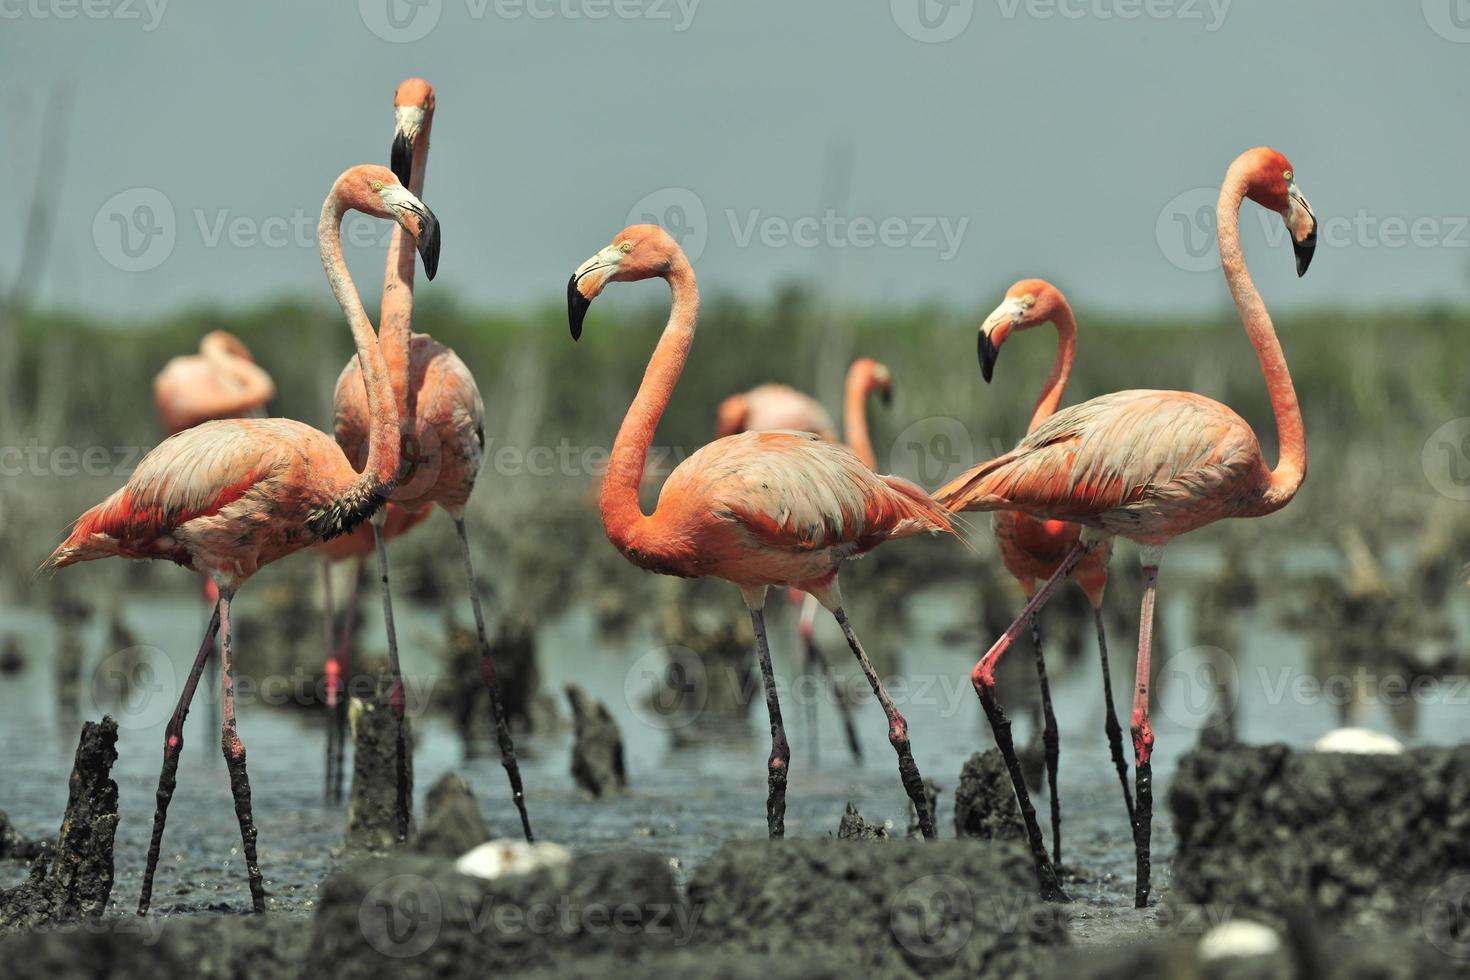 grande flamingo (phoenicopterus ruber) foto